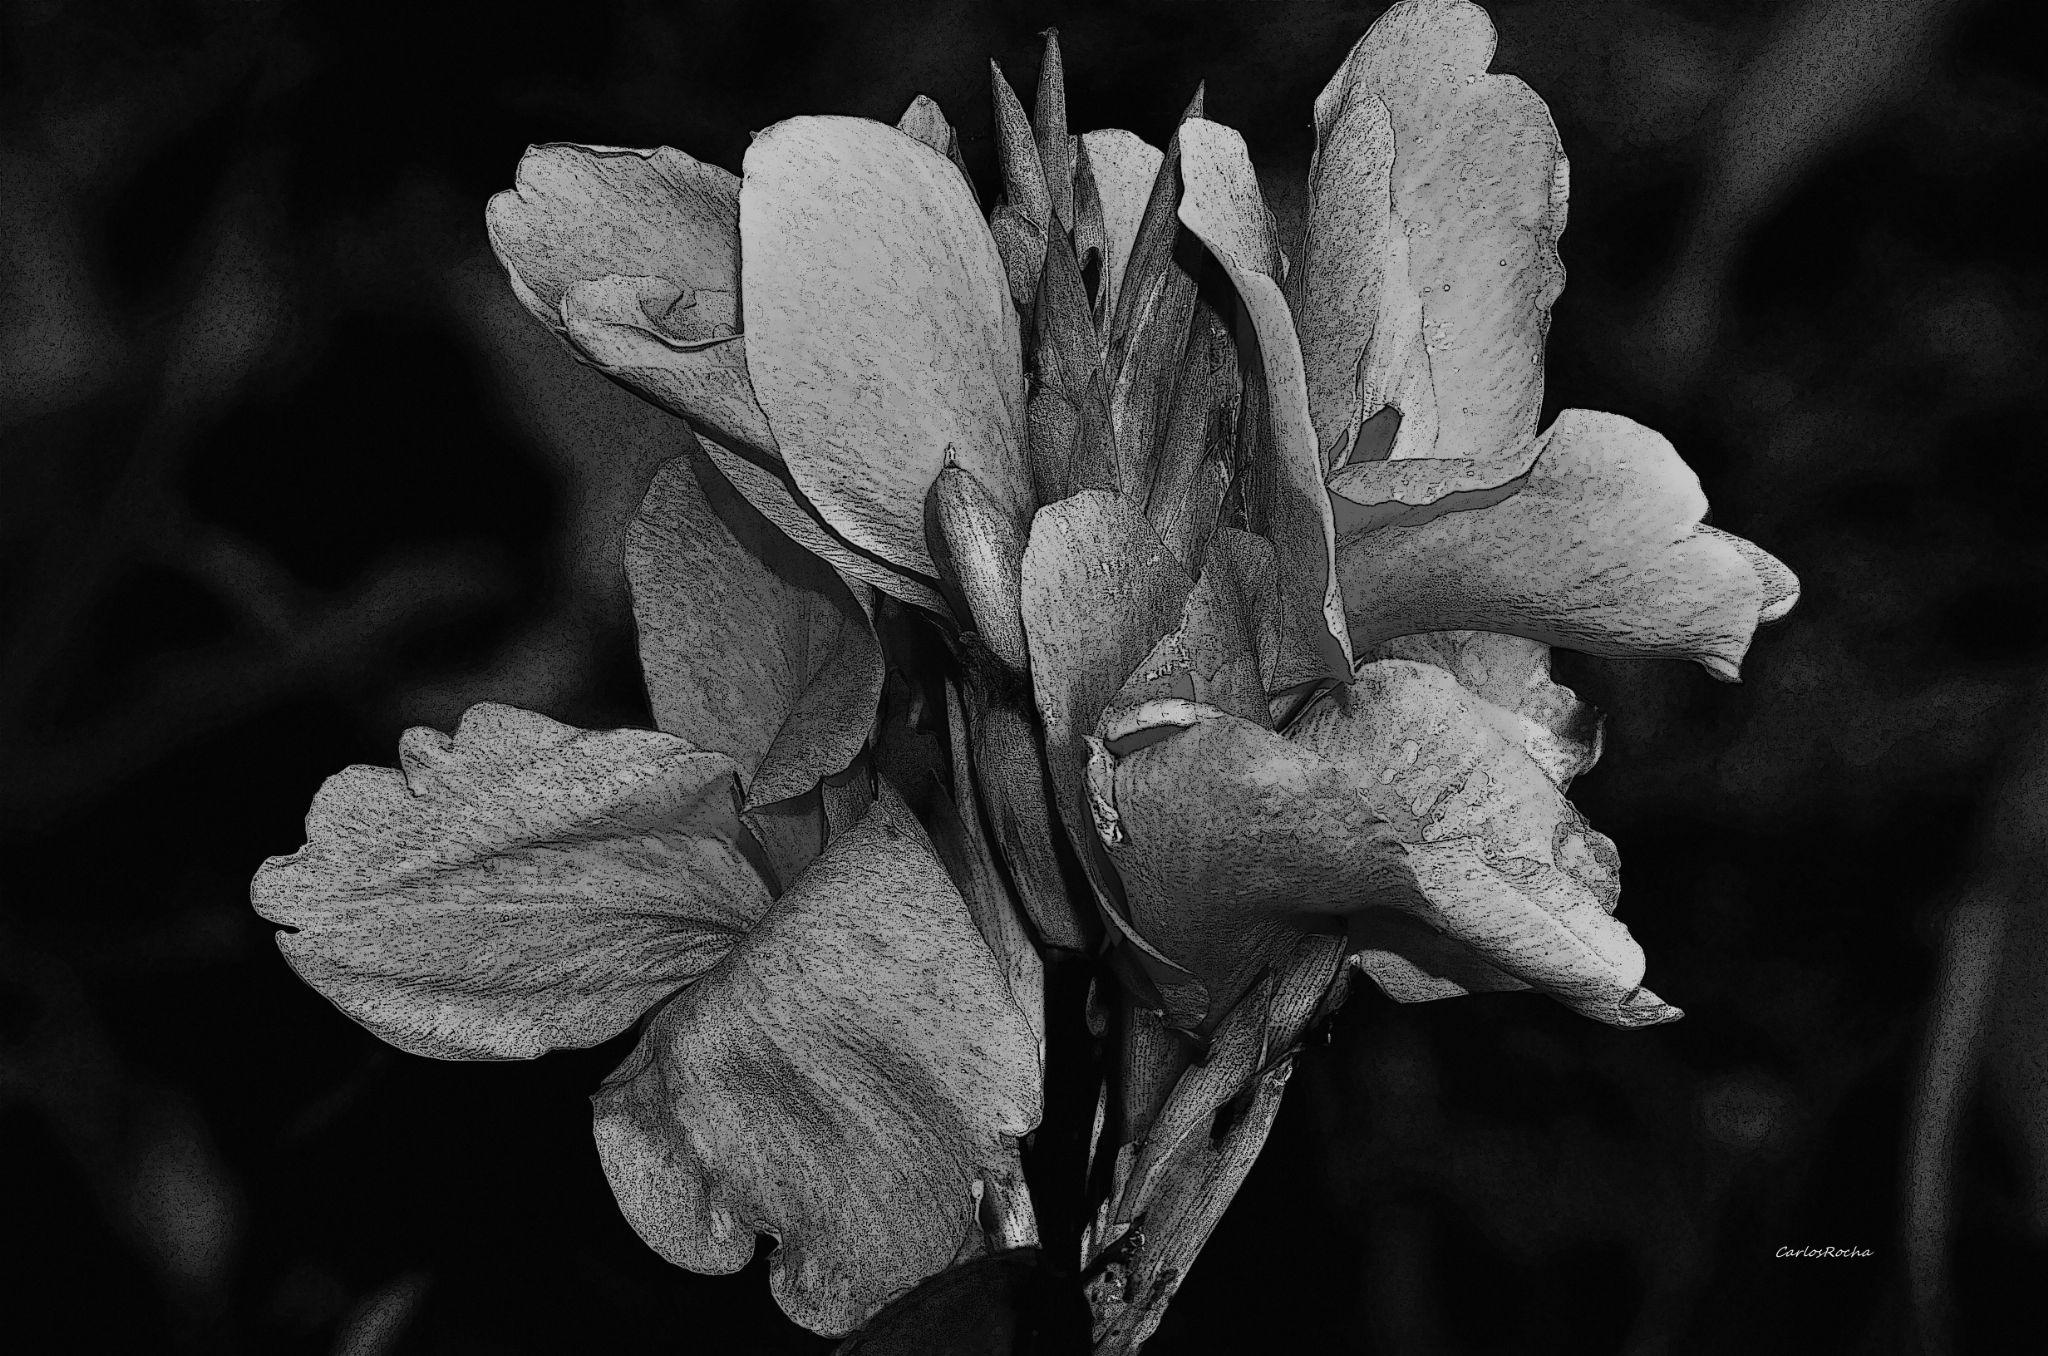 Lirio negro by carlosfiuzar